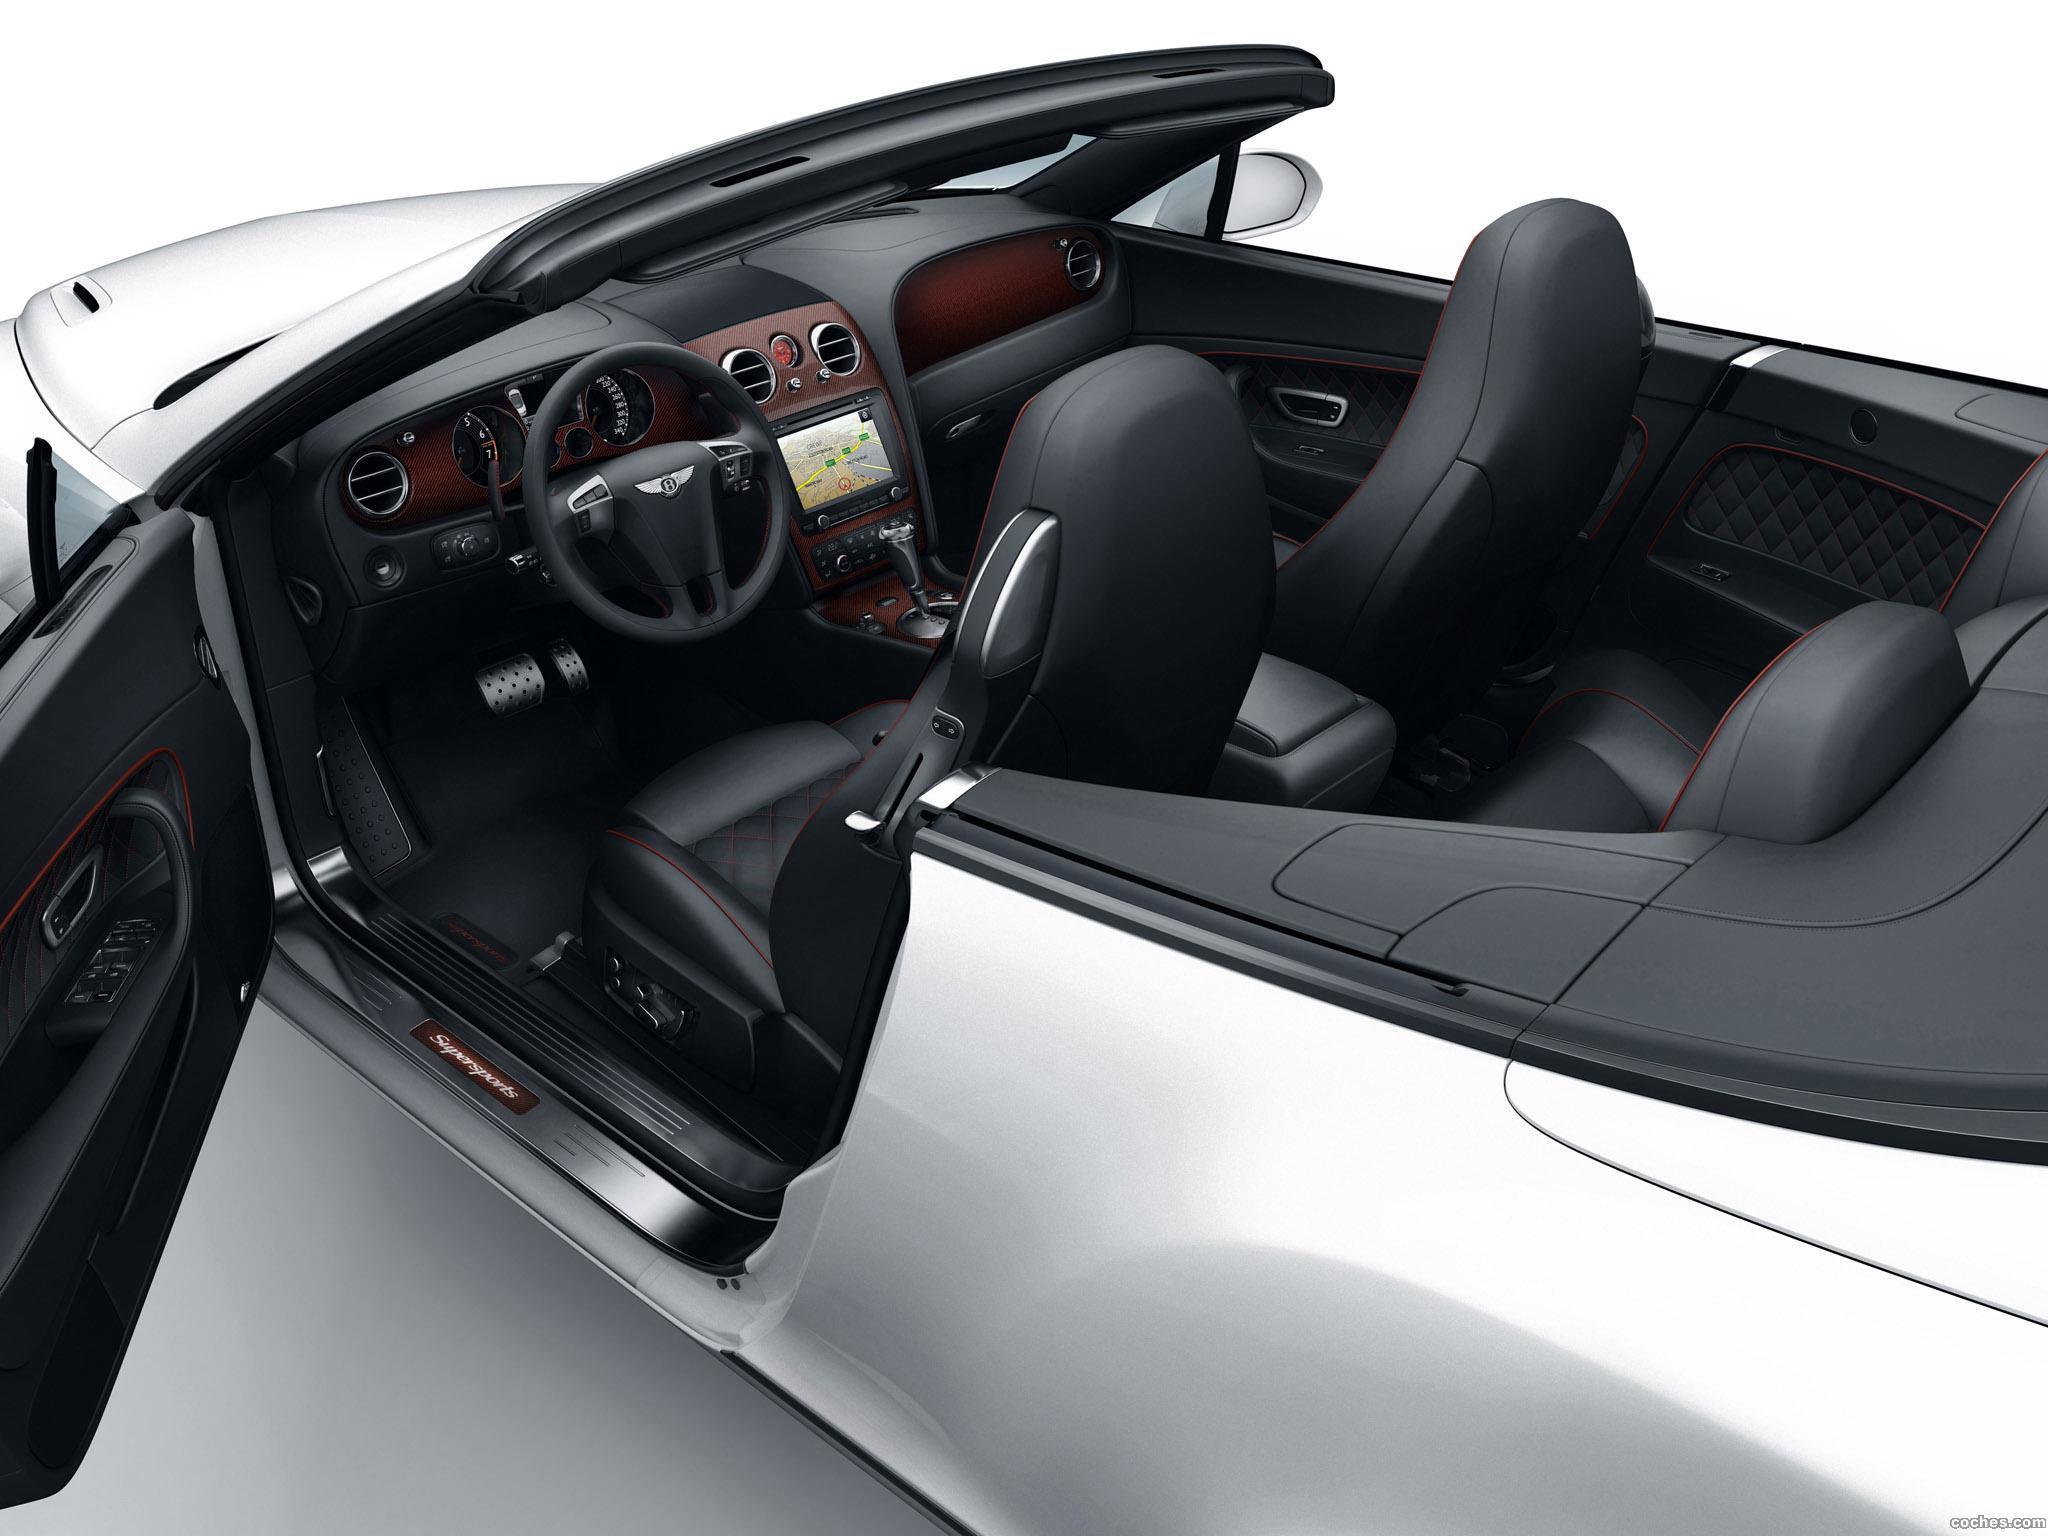 Foto 11 de Bentley Continental-GT Supersports Convertible Ice Record Car 2011